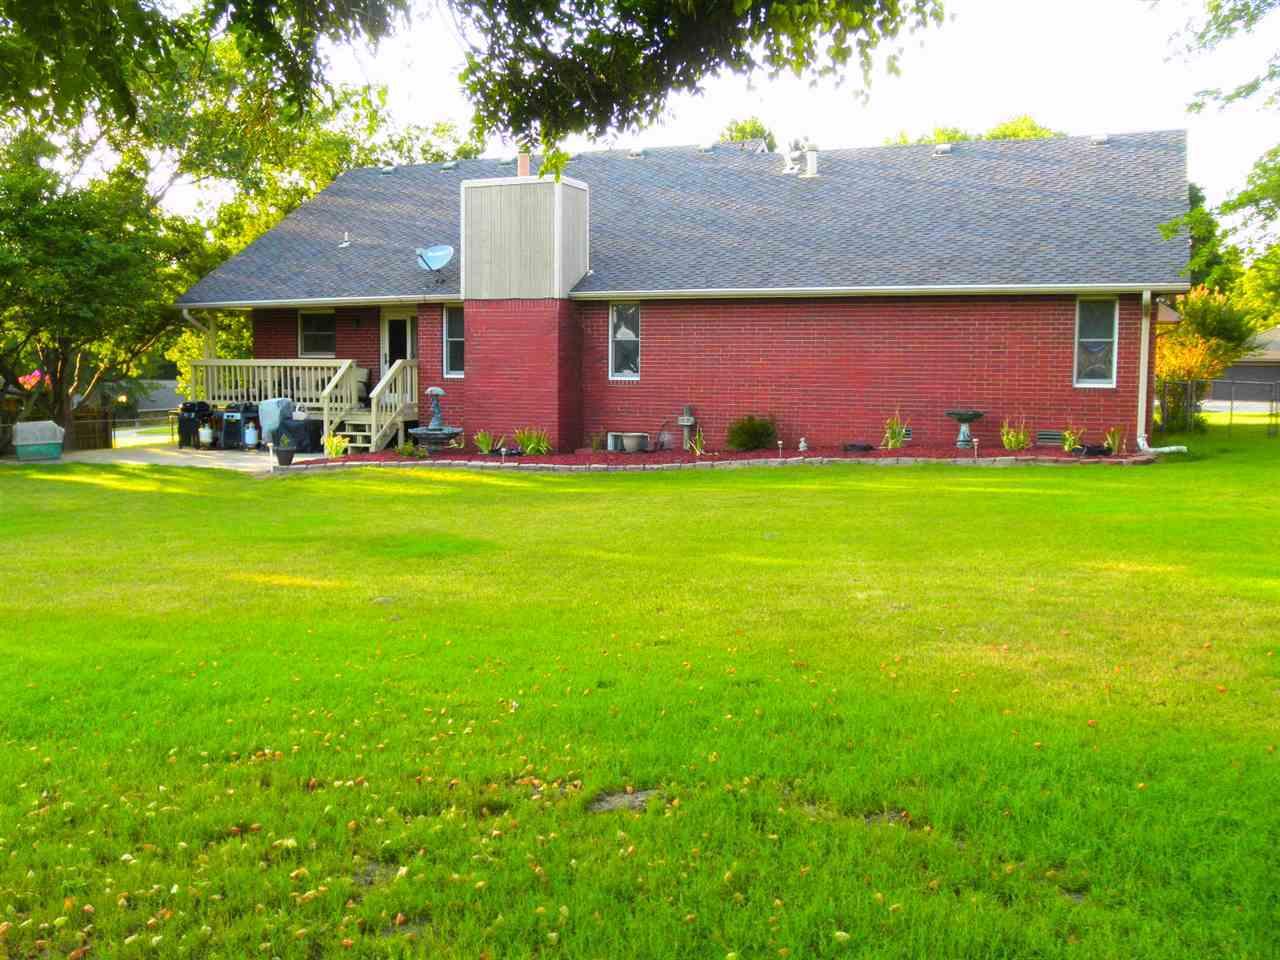 Sold Cross Sale W/ MLS | 32 Raintree Ponca City, OK 74604 34